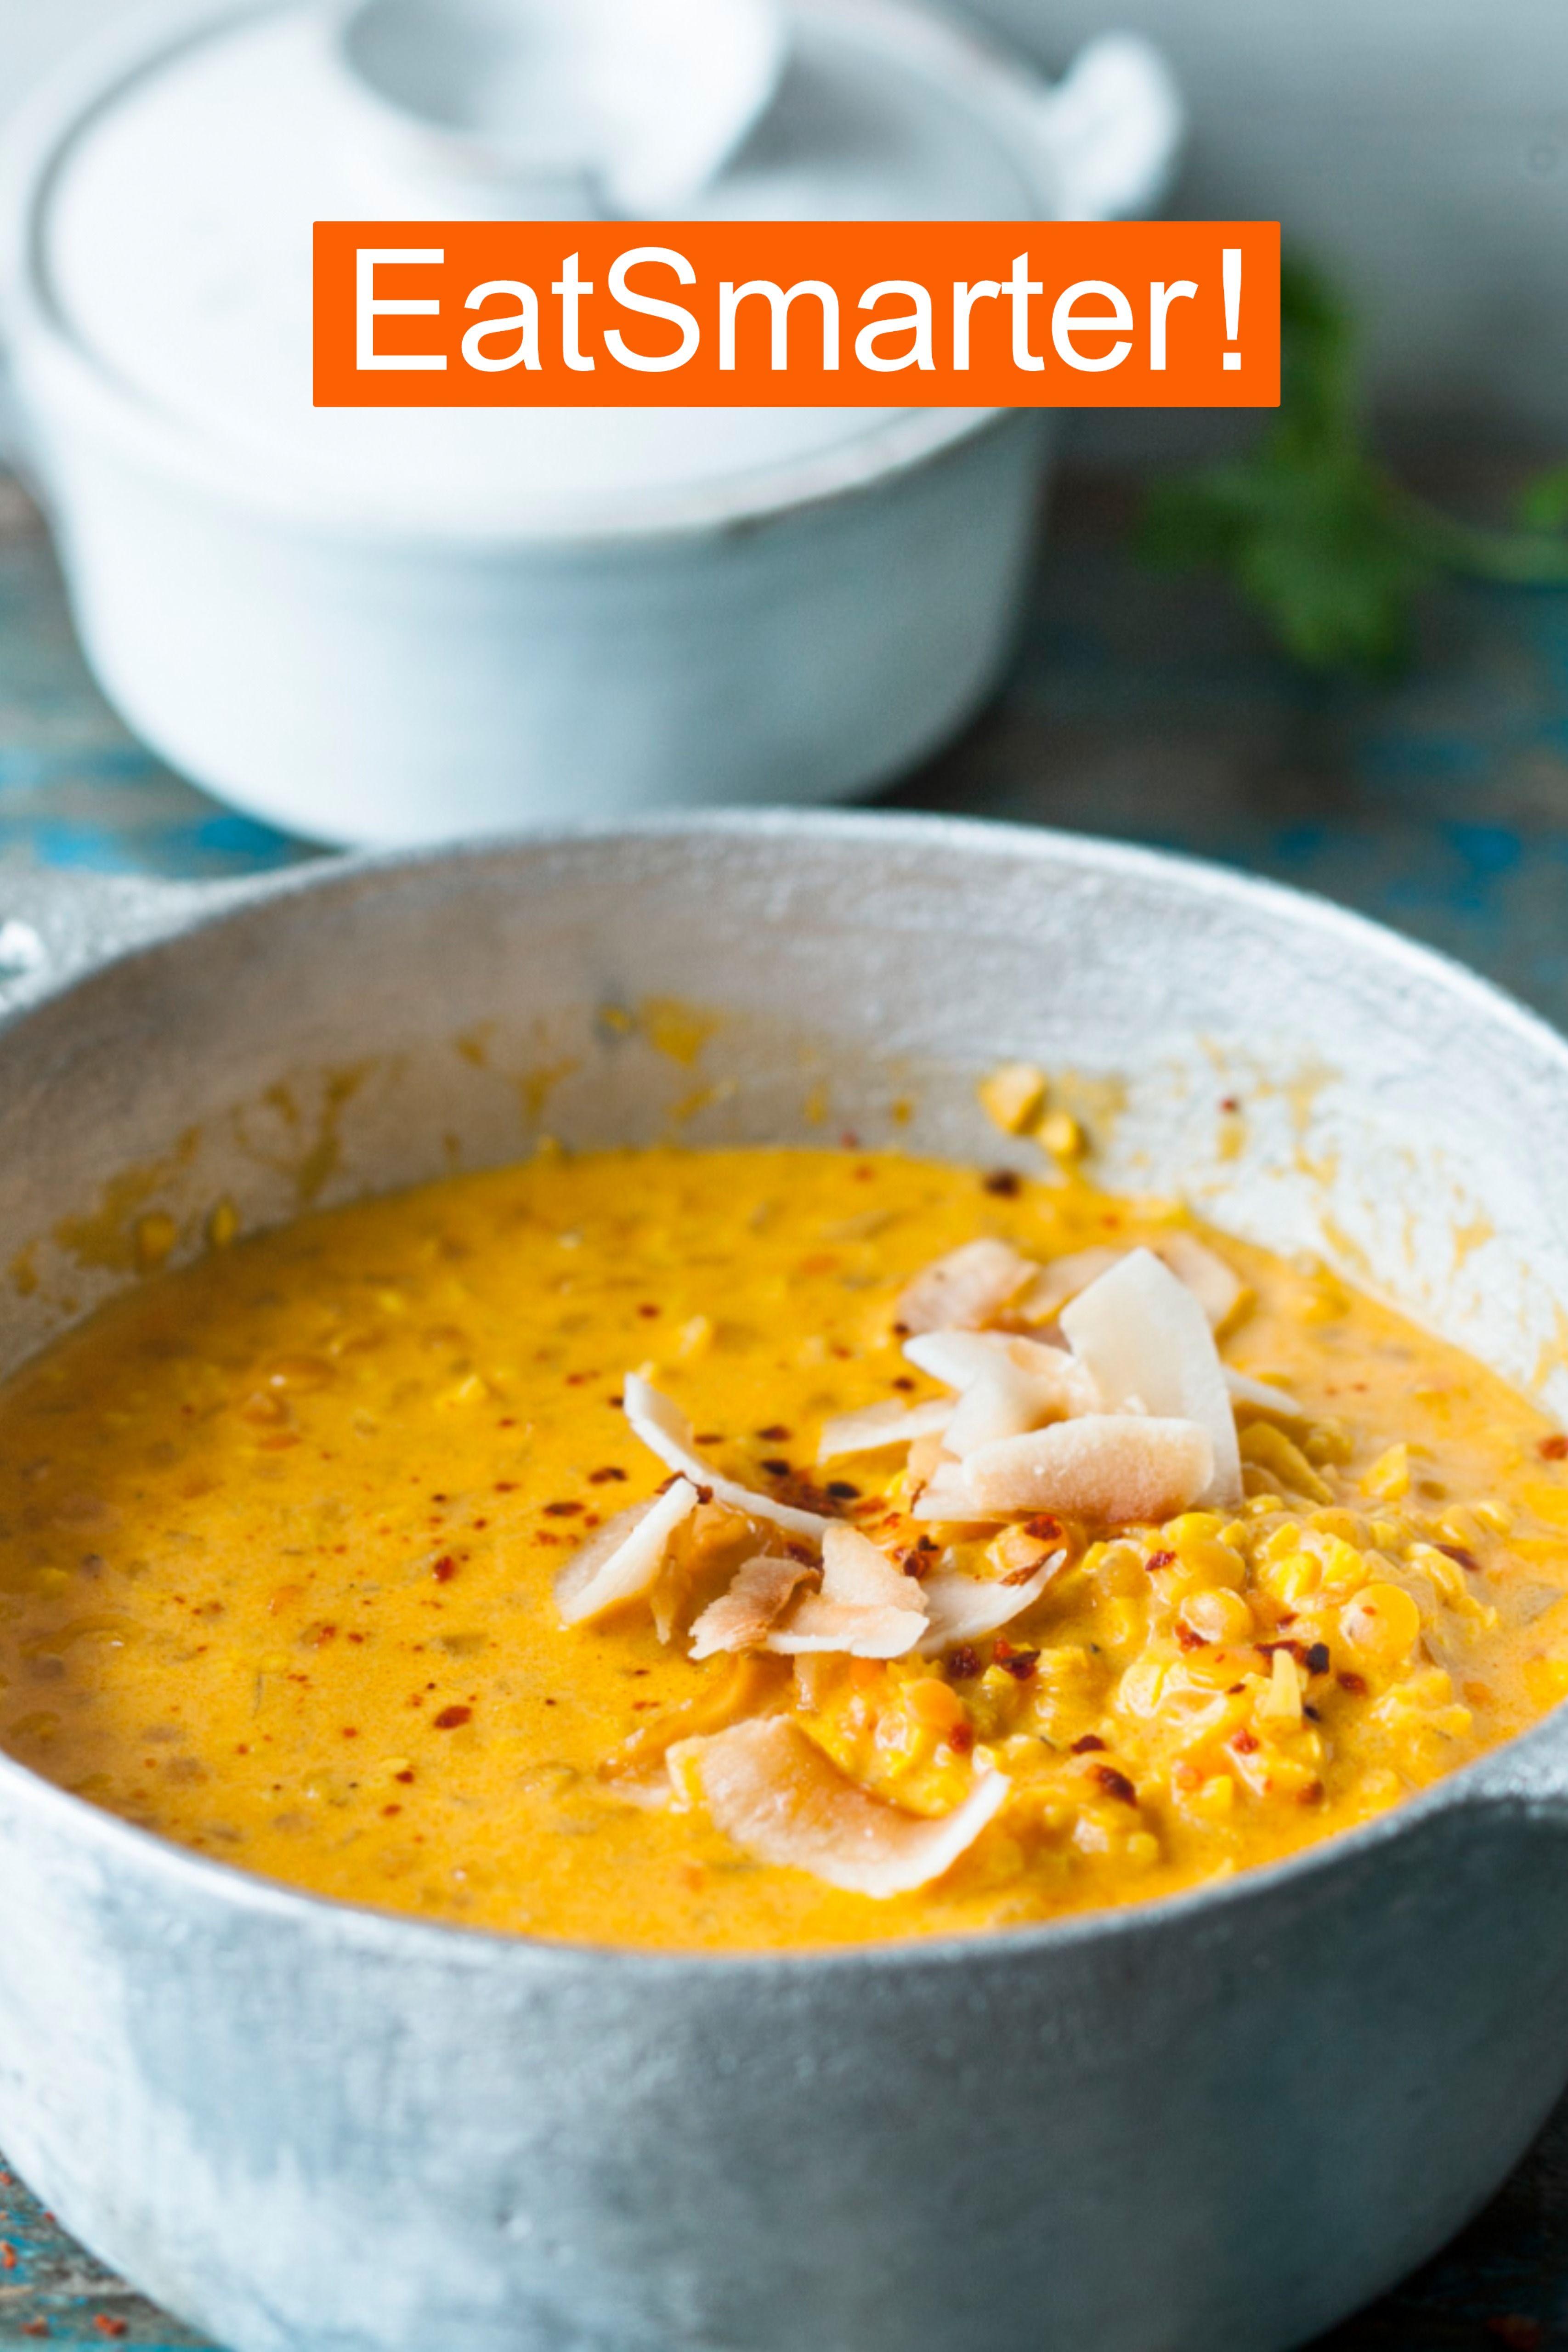 Schnelles Feierabend Rezept für Curry-Linsen-Dal | EAT SMARTER